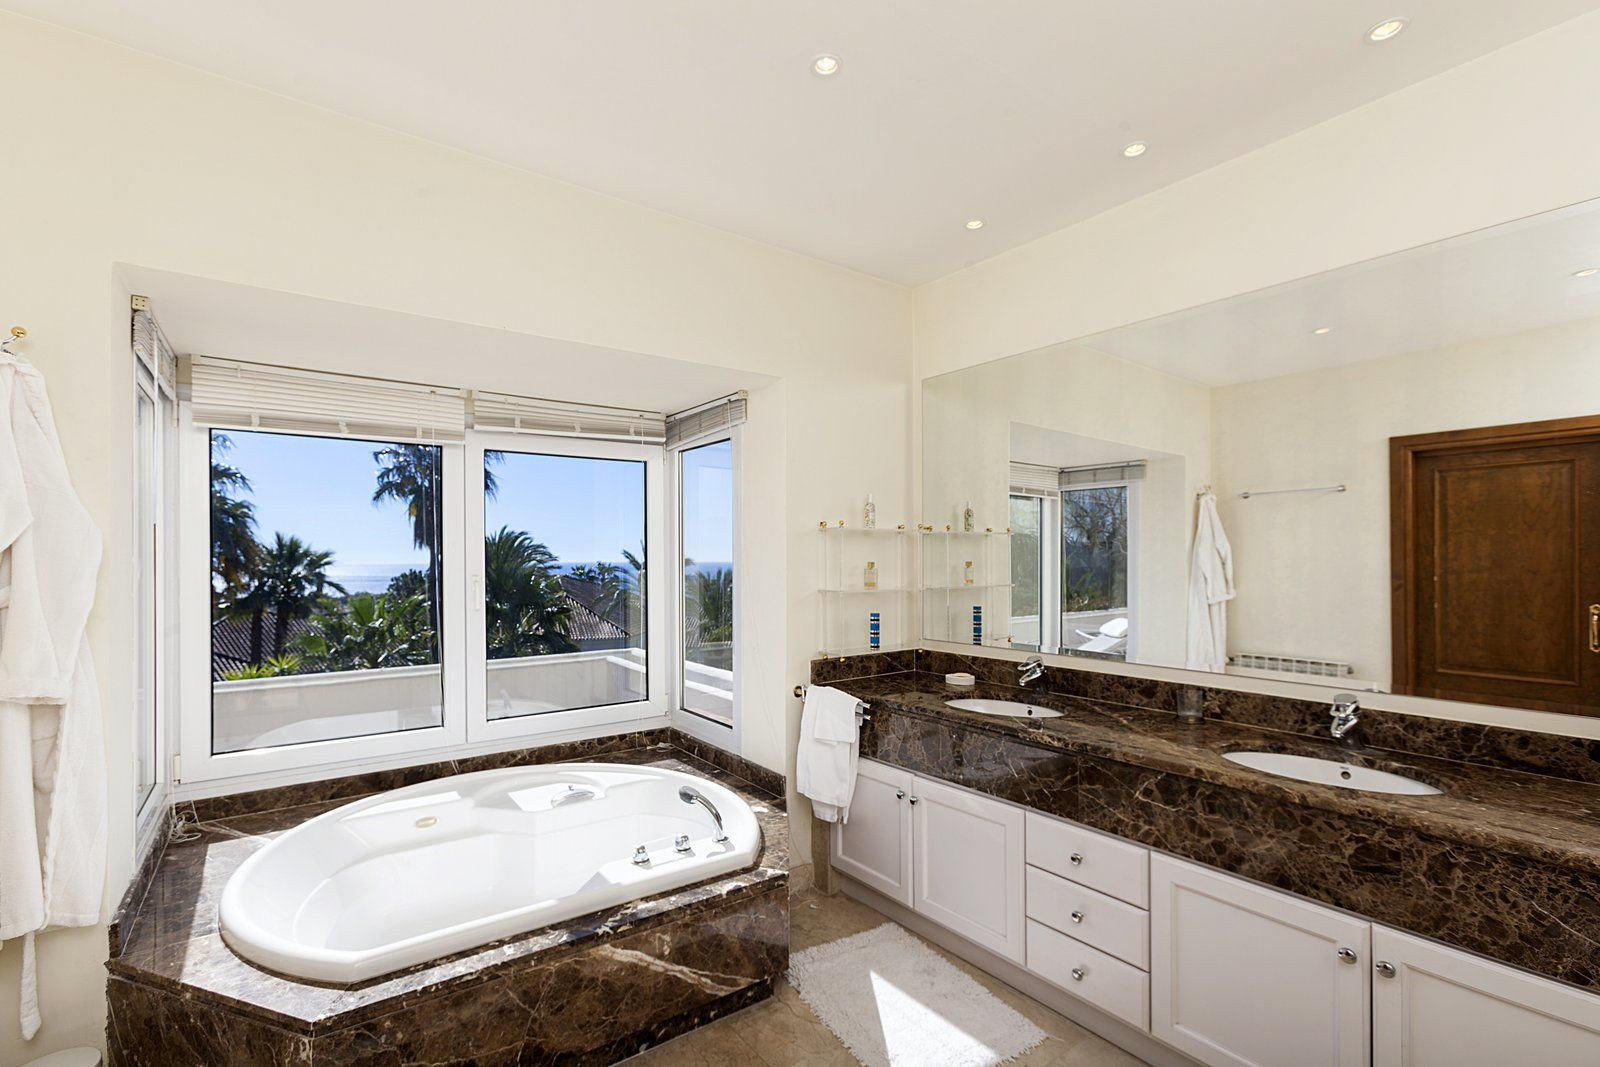 Villa For Sale in Sierra Blanca, Marbella